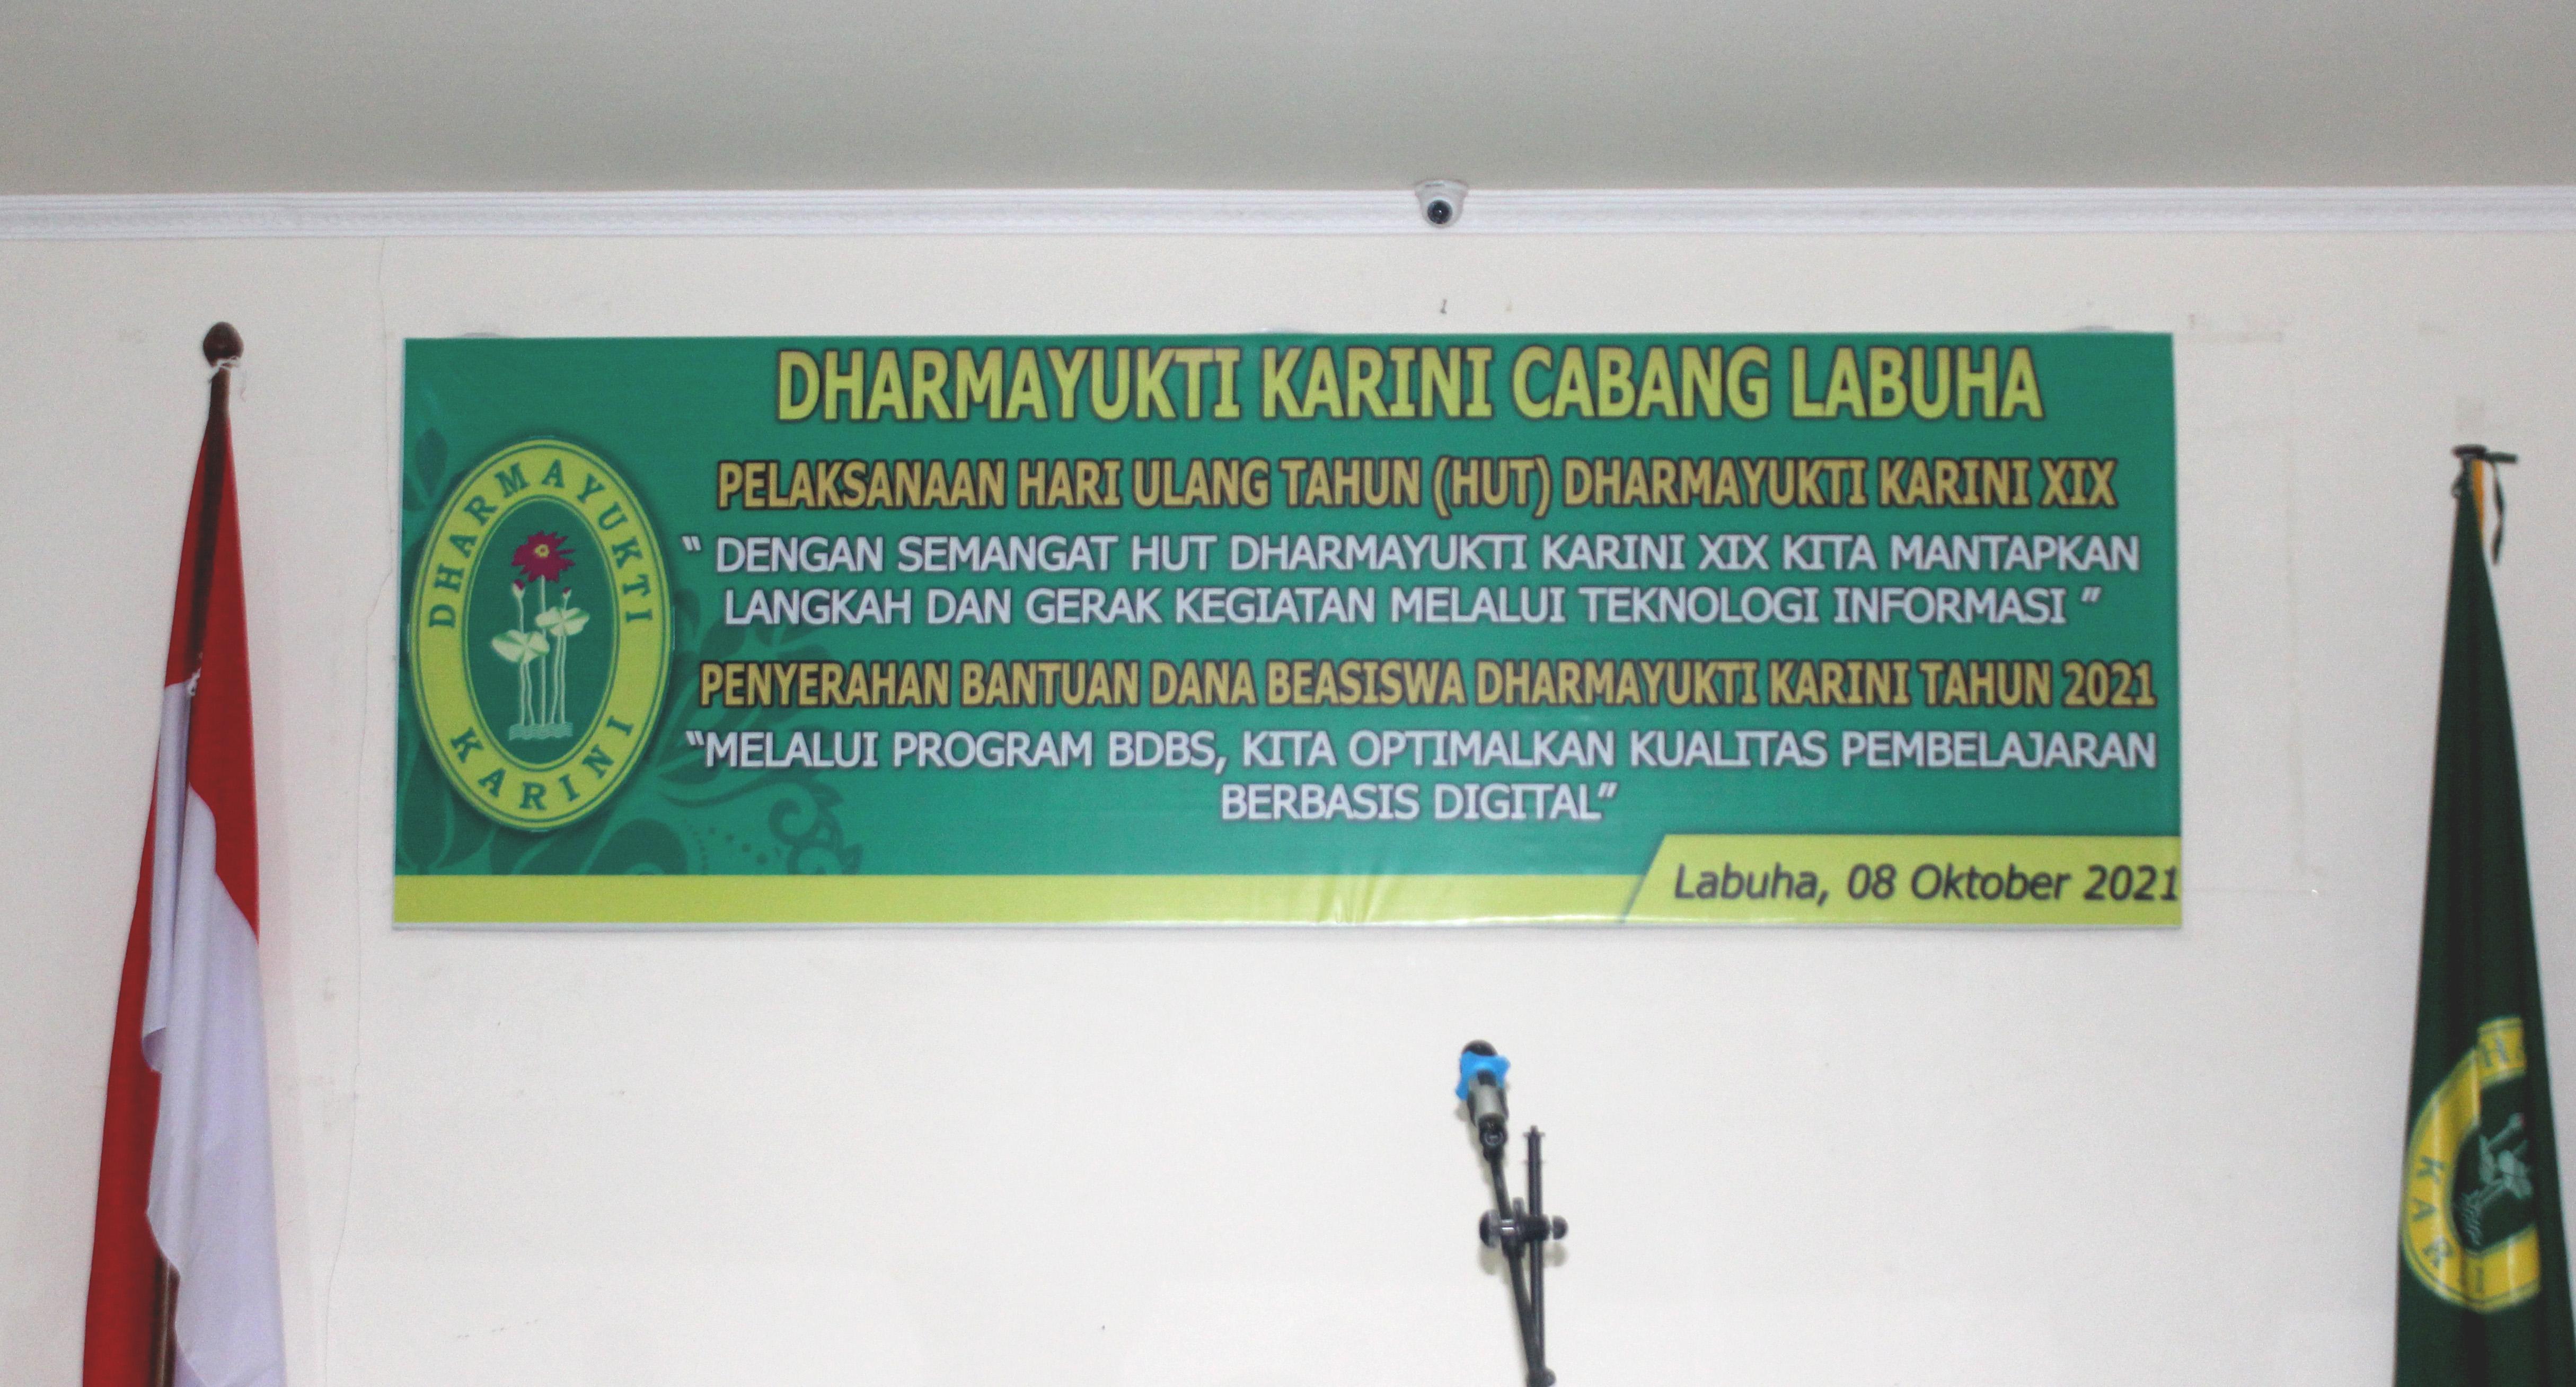 Pelaksanaan Hari Ulang Tahun Dharmayukti Karini Ke XIX dan Penyerahan Bantuan Dana Beasiswa Tahun 2021